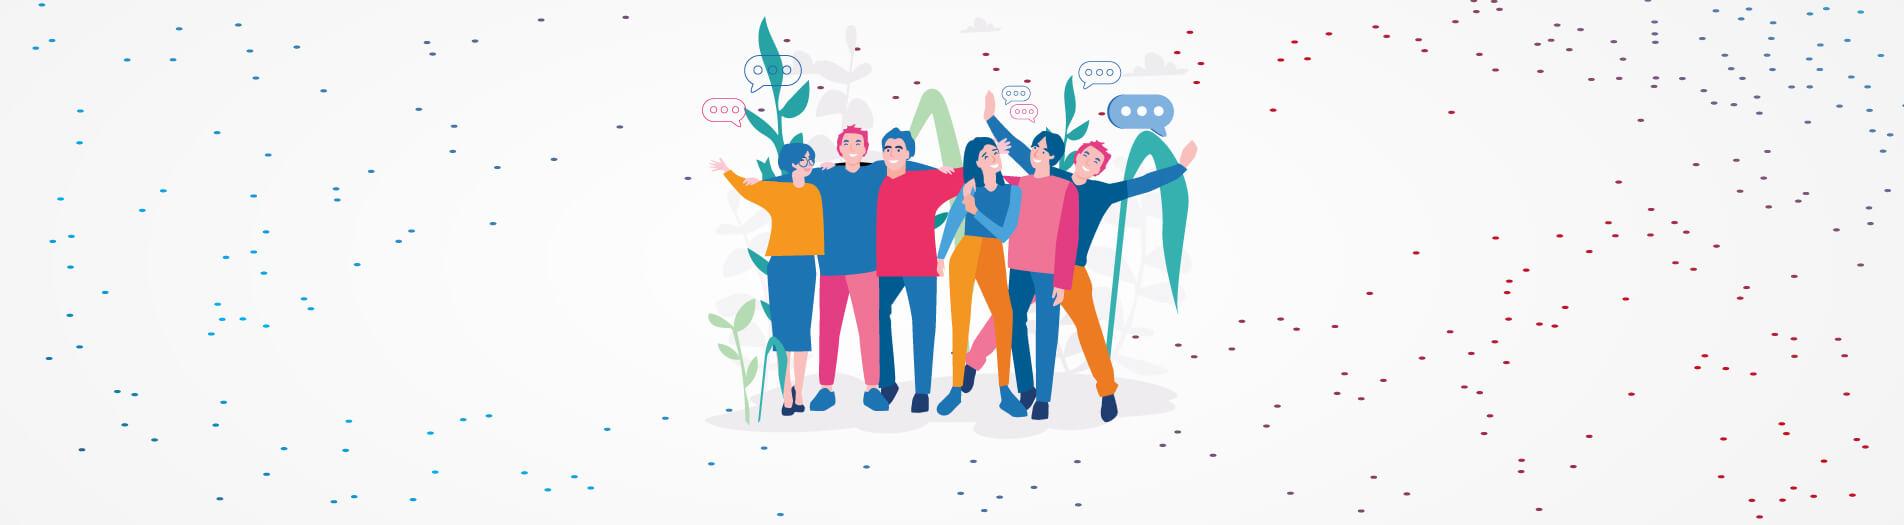 احترام بدون پیشداوری؛ کلید جلب مشارکت نوجوانان